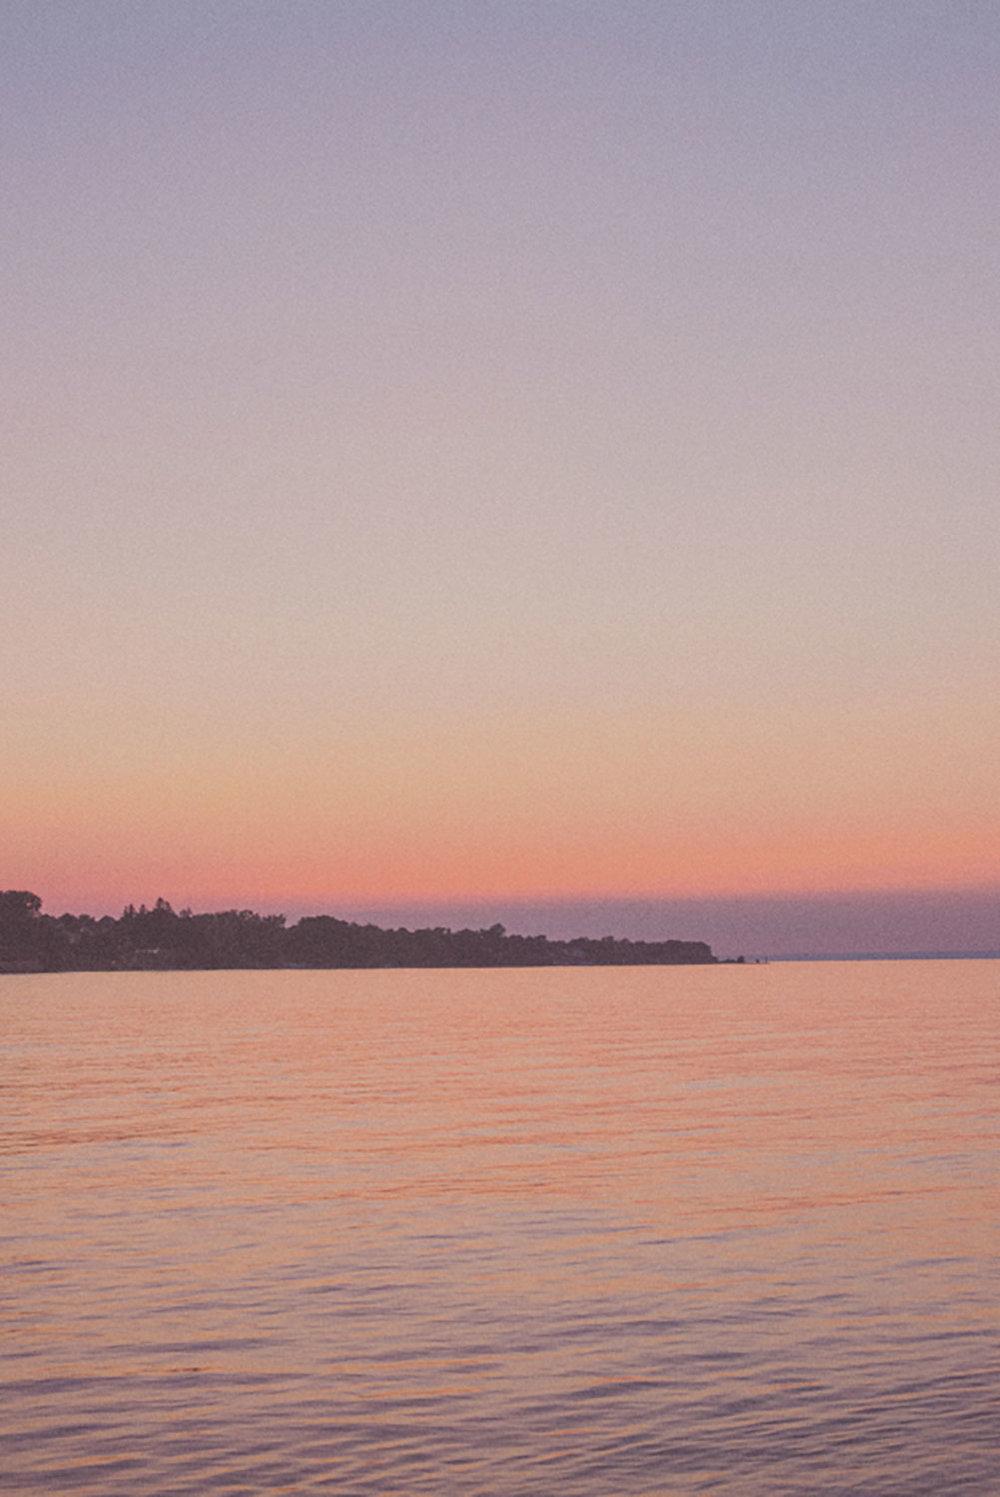 Grimbsy-Beach-Editorial-Vineyard-Bride-photo-by-Destiny-Dawn-Photography-045.JPG